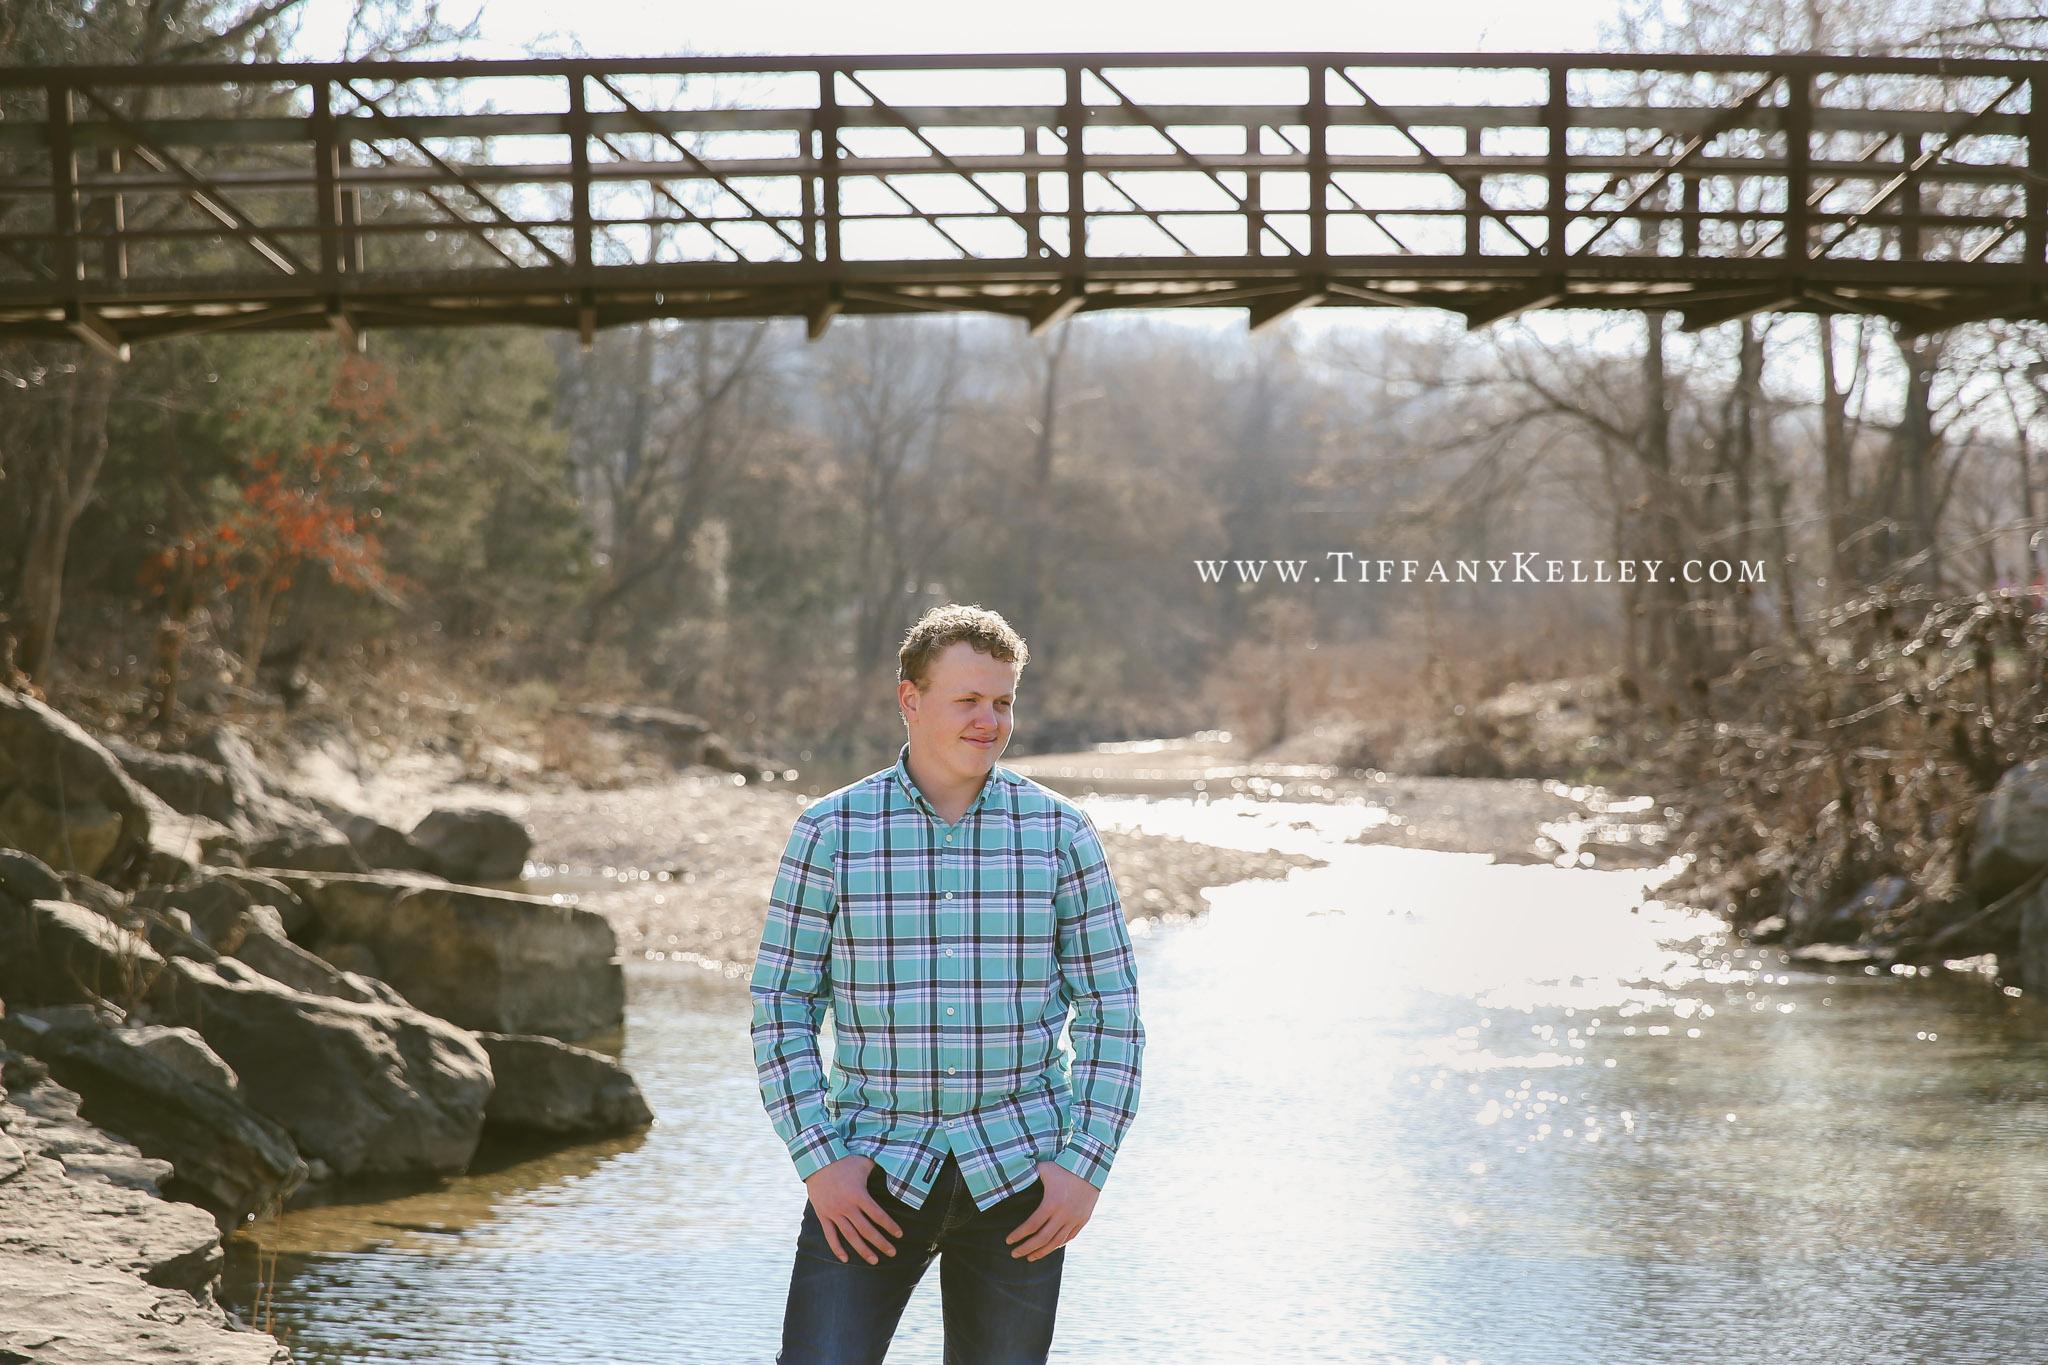 Grant Branson Springfield MO Senior Portrait Photographer - Tiffany Kelley Photography